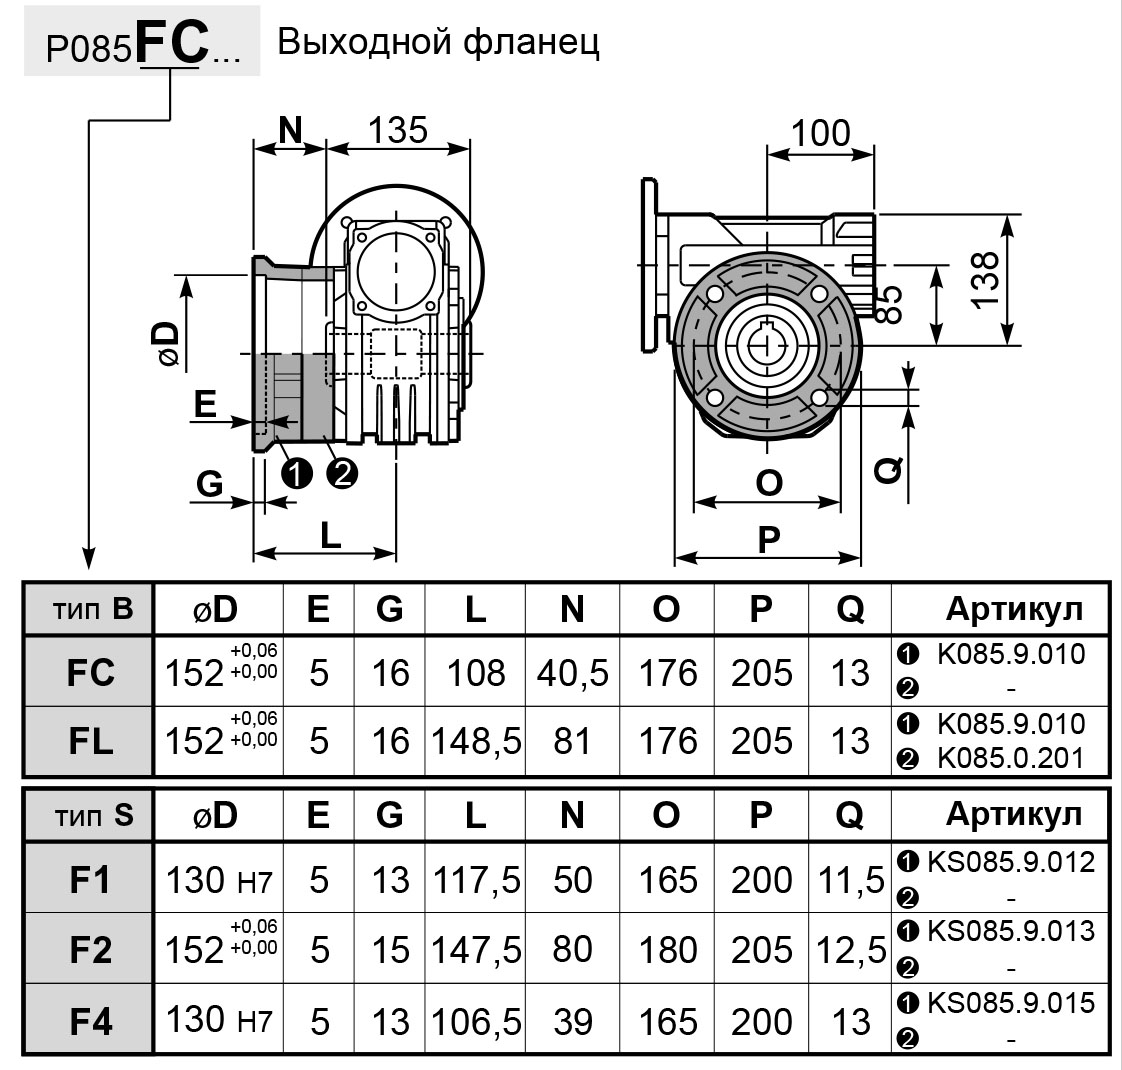 Чертеж редуктора P 085 innovari фланцы